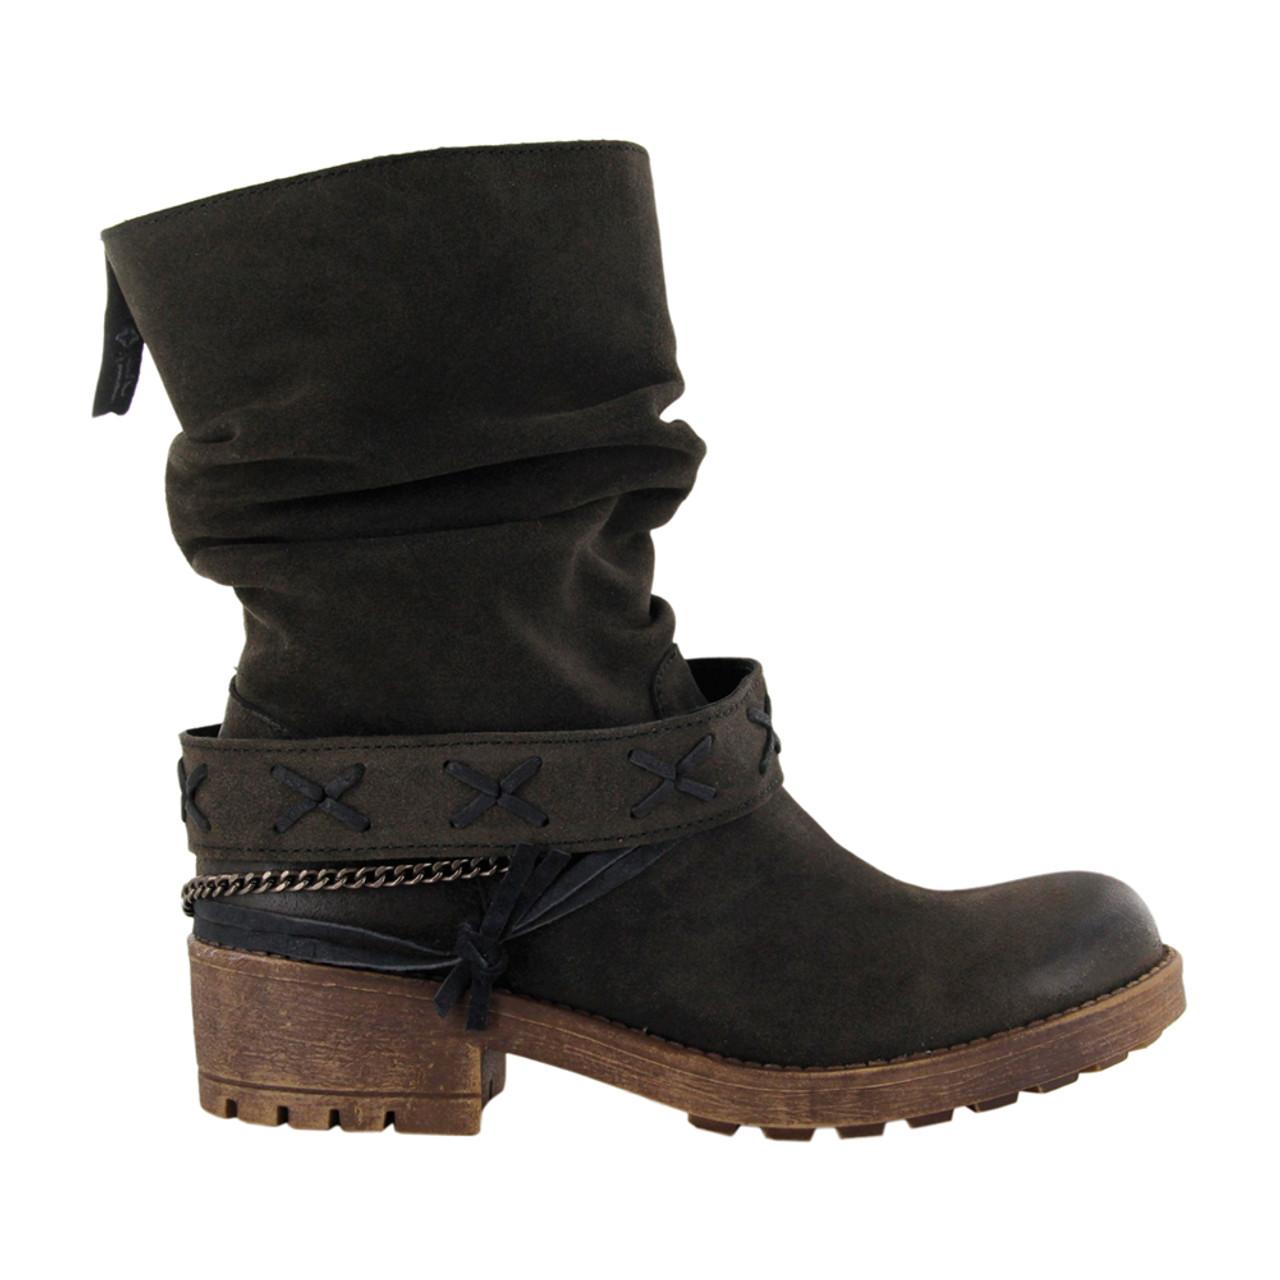 1ca17716021 Coolway Women's Angus Boot Black